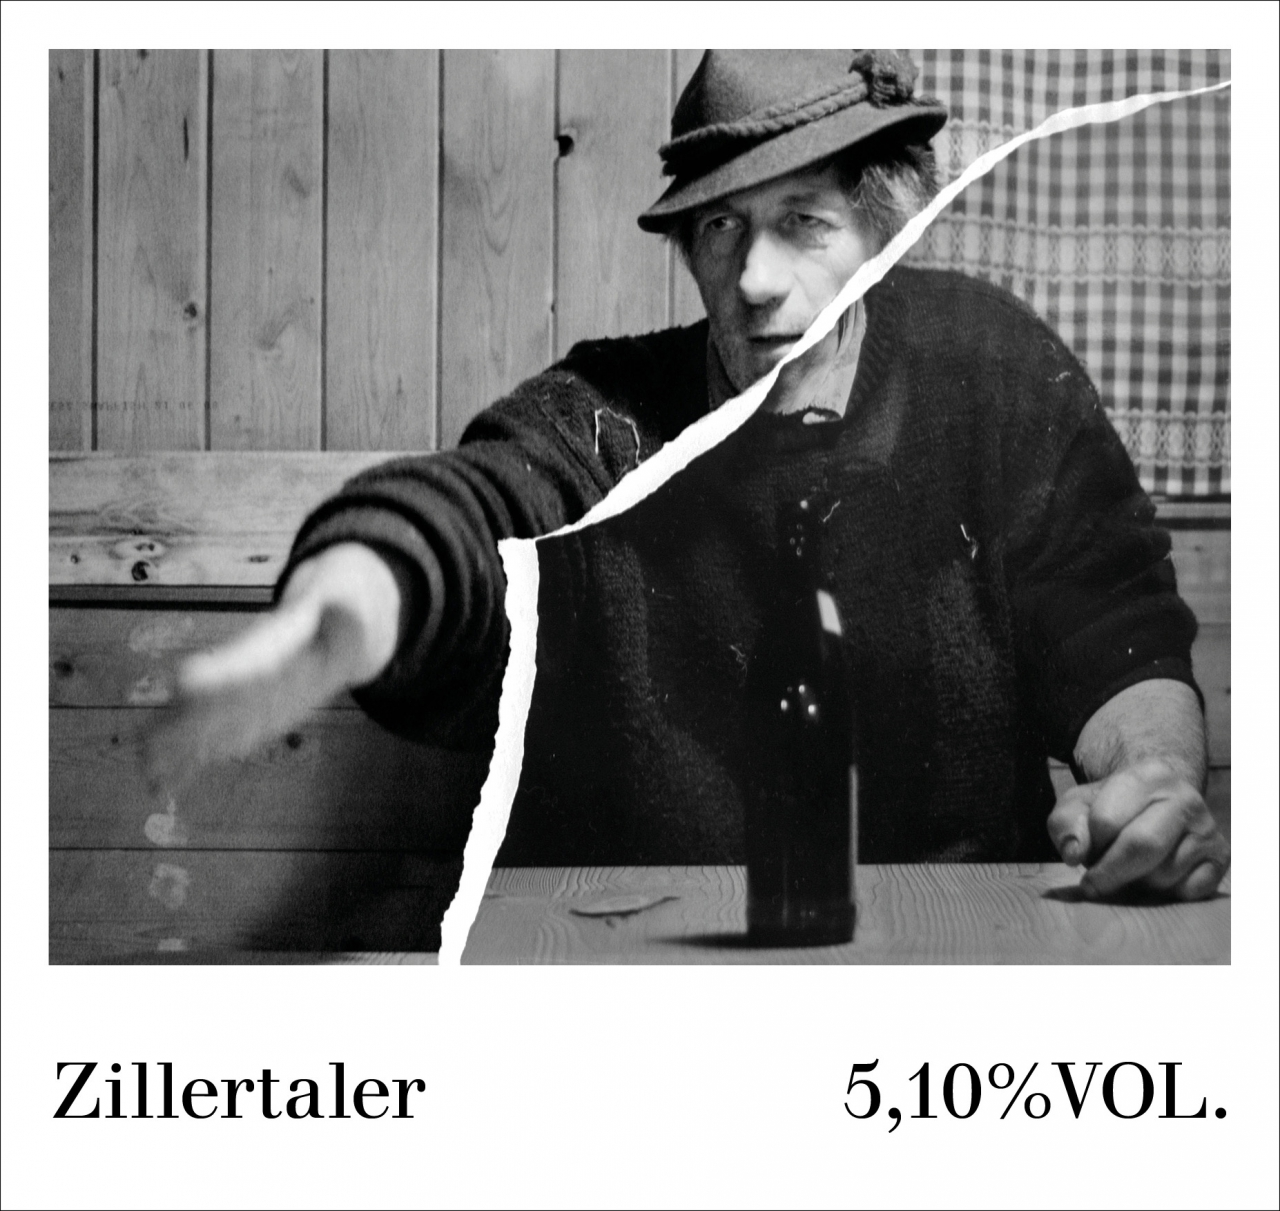 Jens Mittelsdorf - Büro für Gestaltung 5,10%VOL. → Grafikdesign, Fotografie, Poster